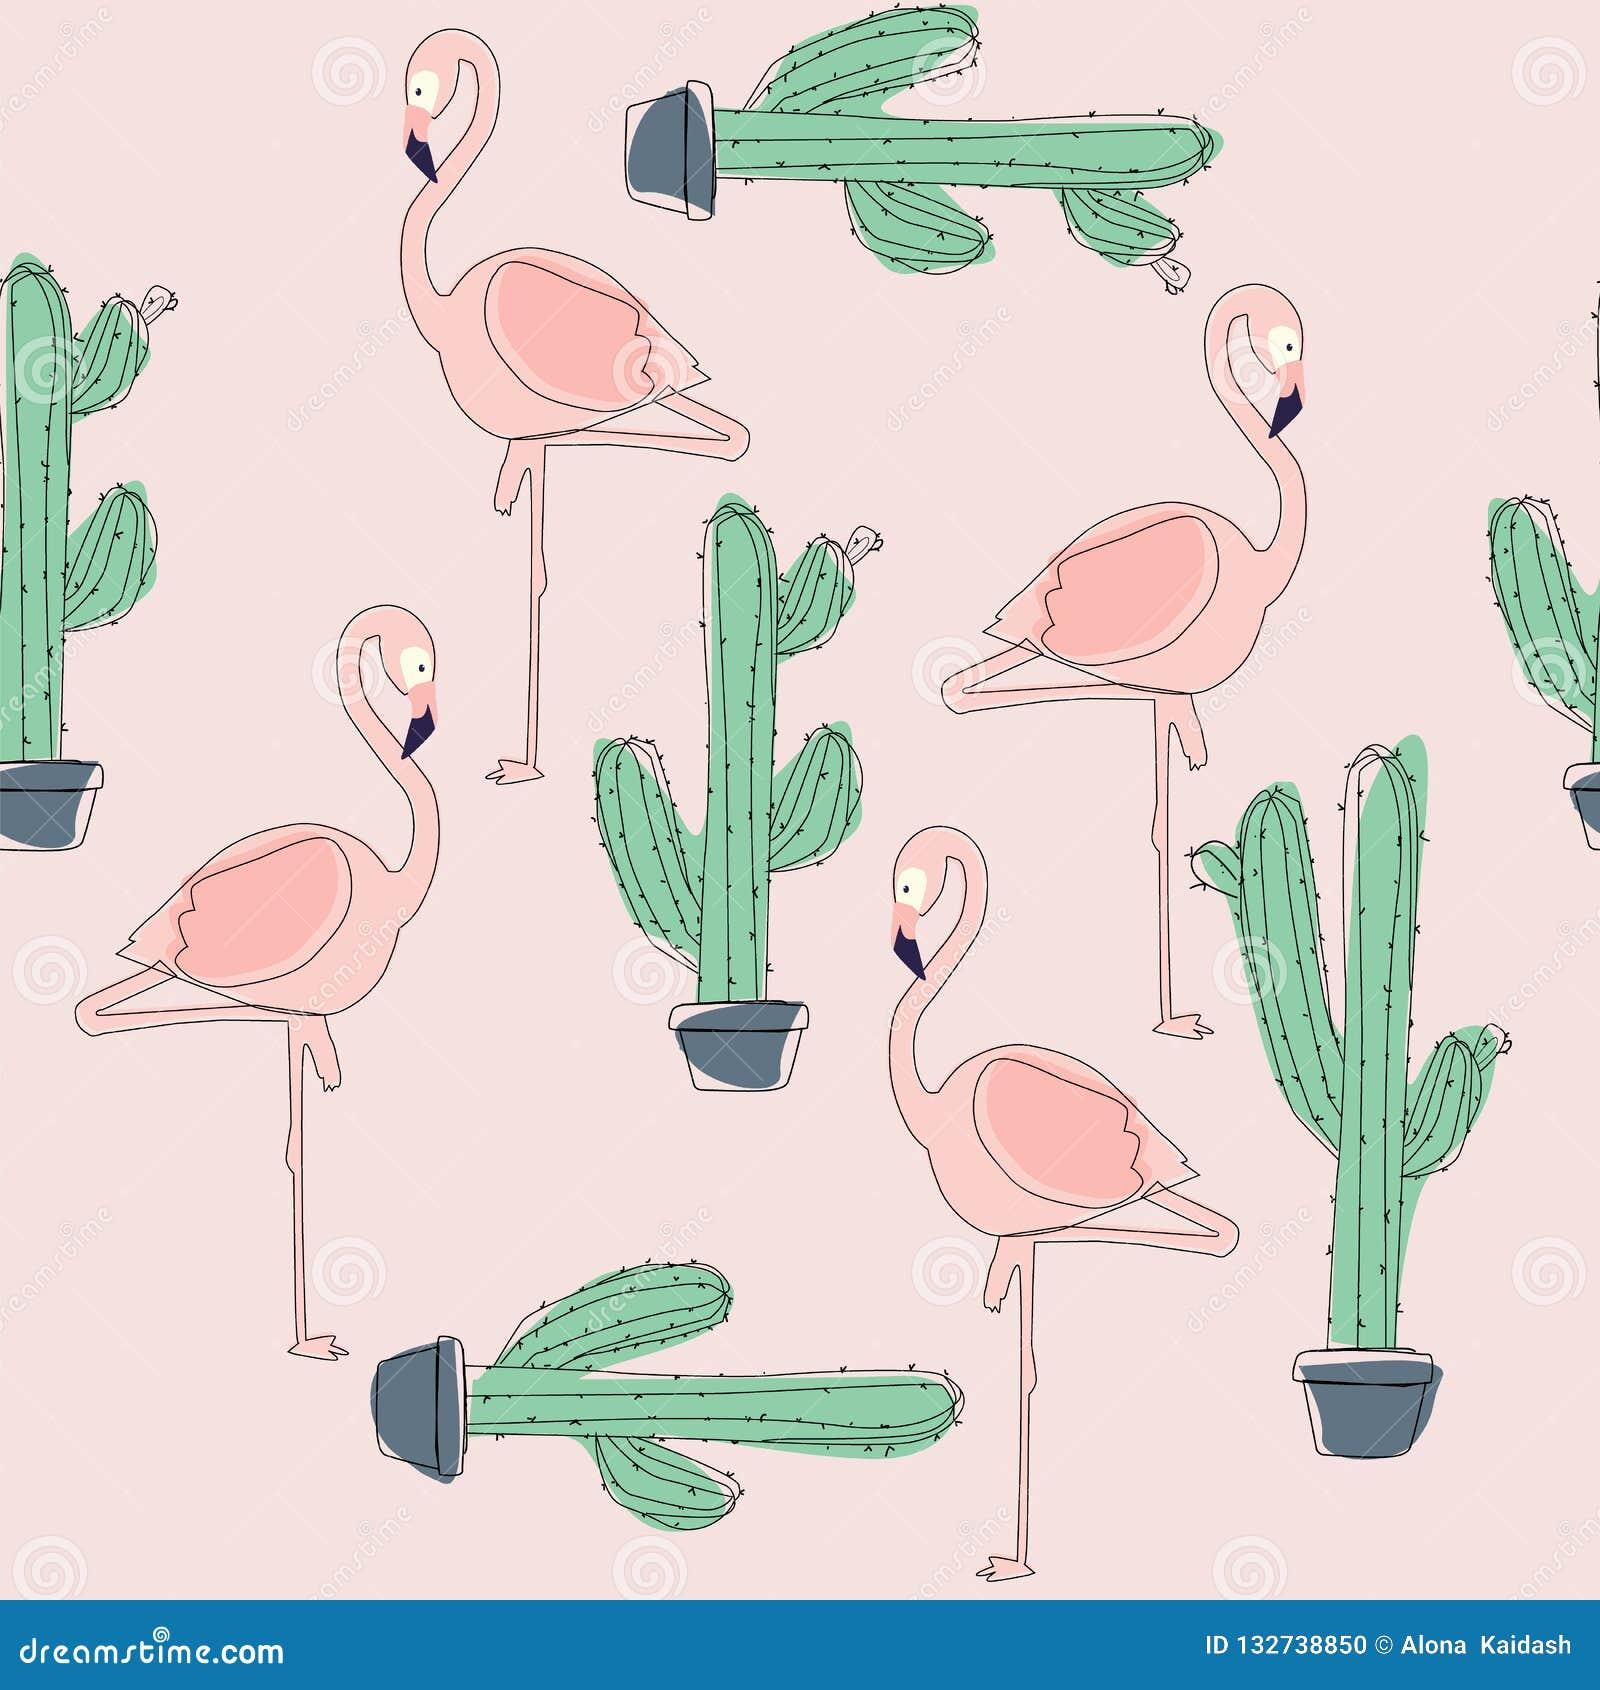 Tropical Flamingo Bird and Cactus Background.